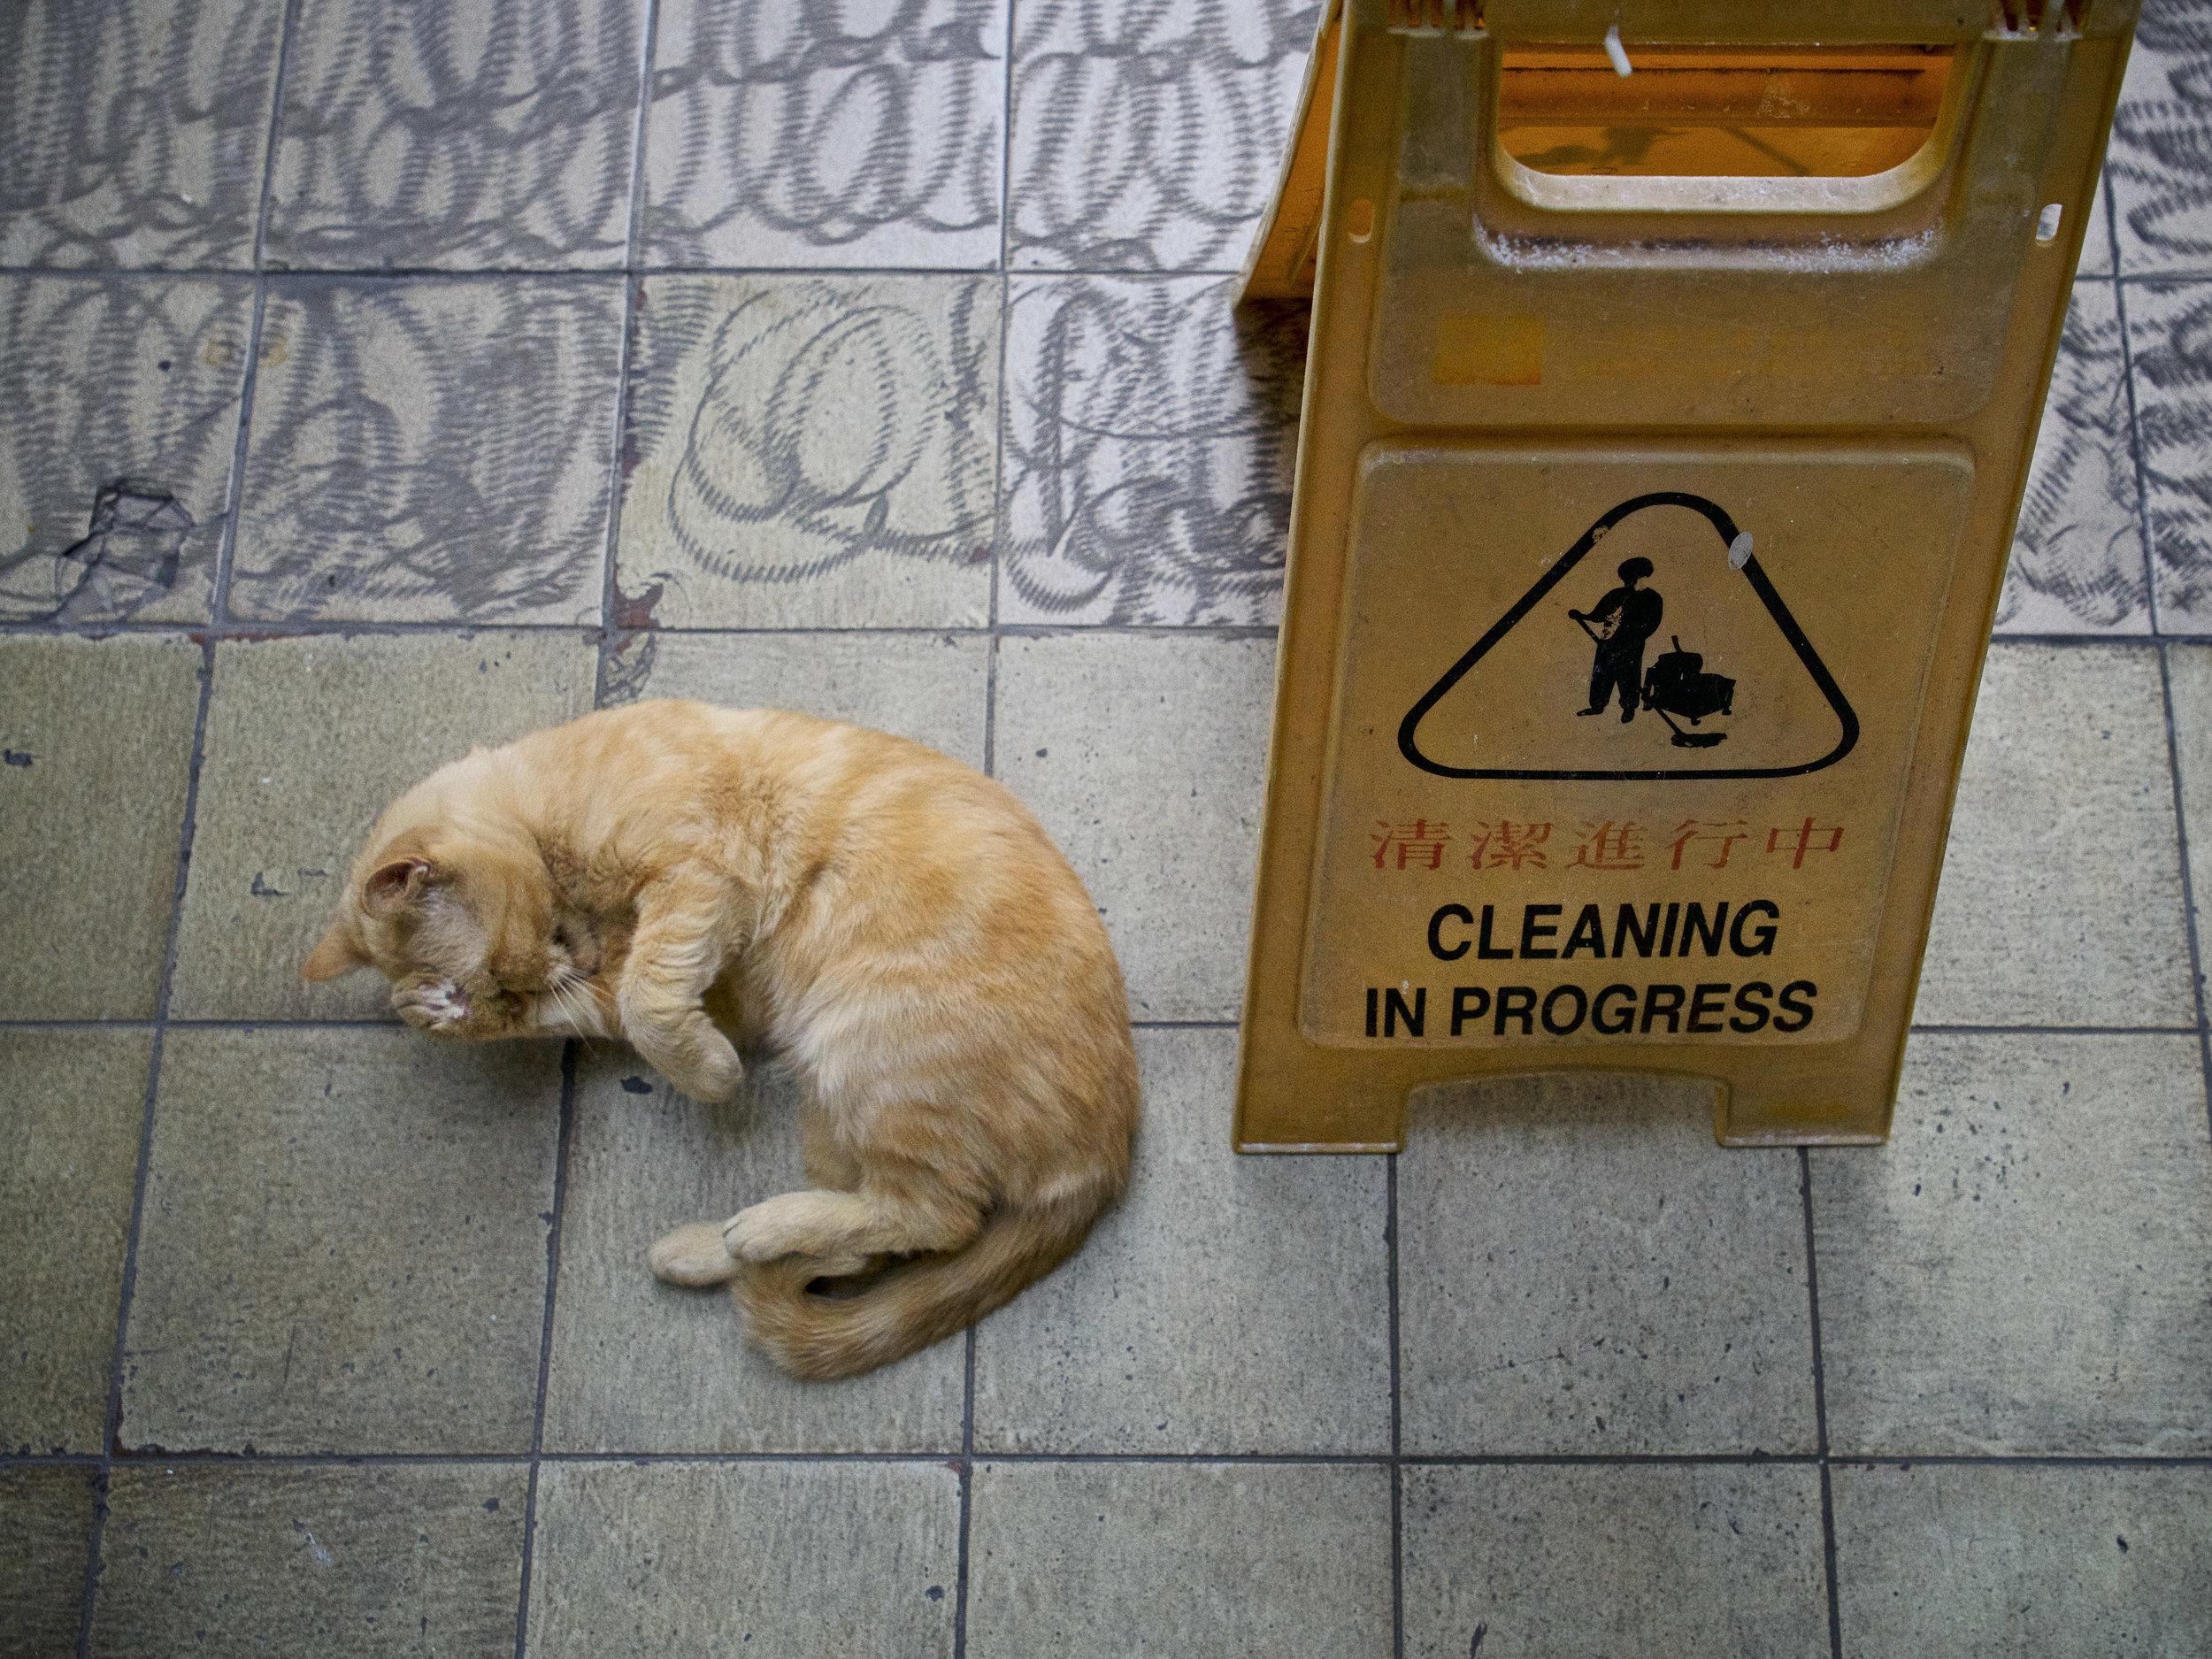 Marcel Heijnen, 'Cleaning in Progress'